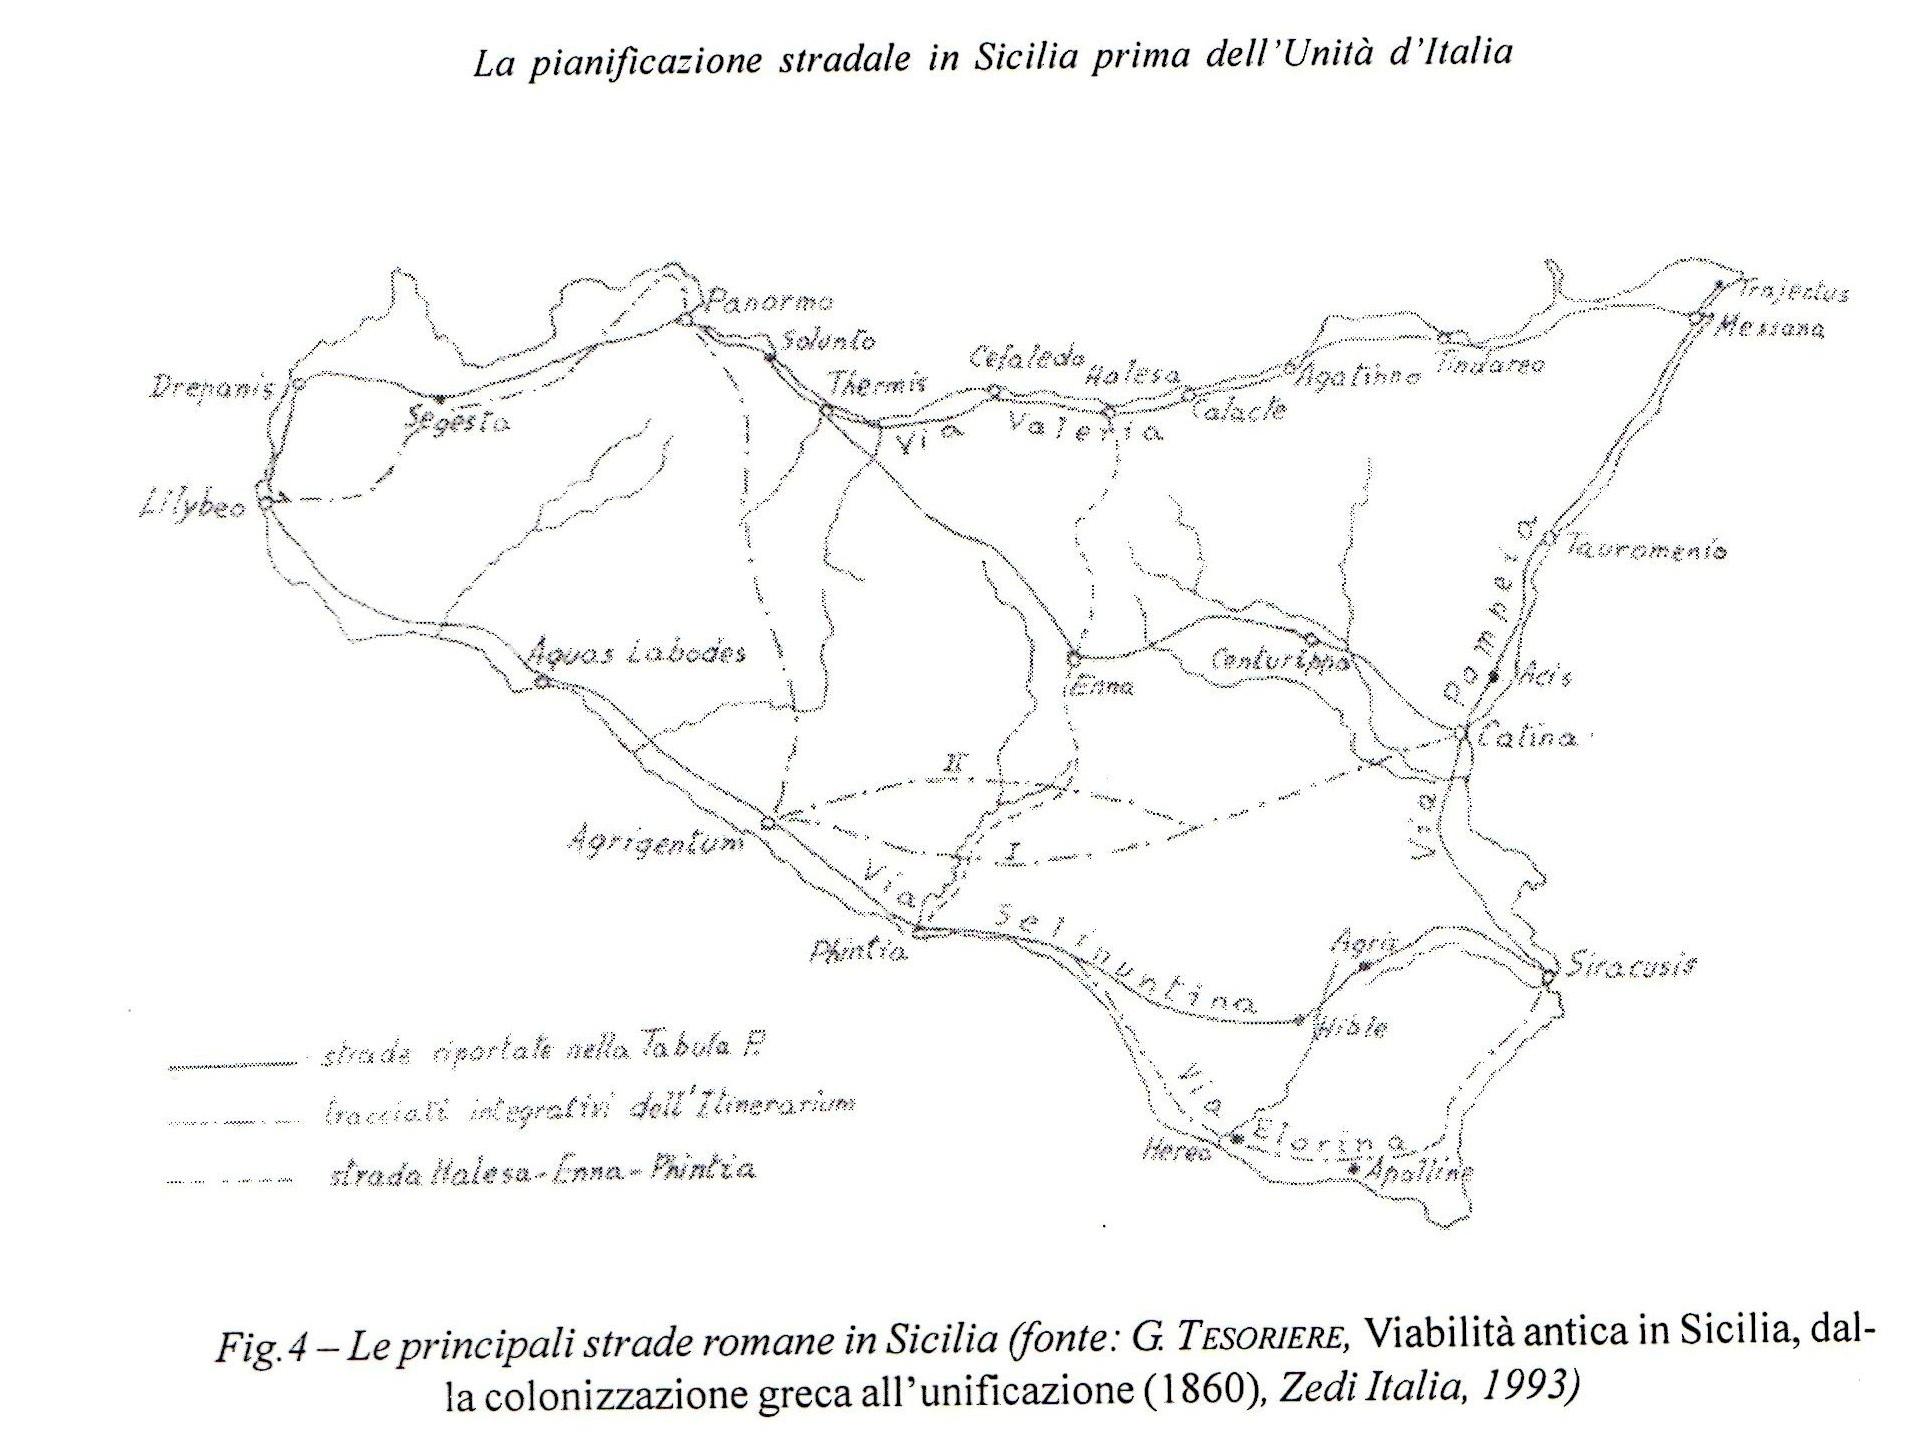 Tesoriere Mappa strade romane